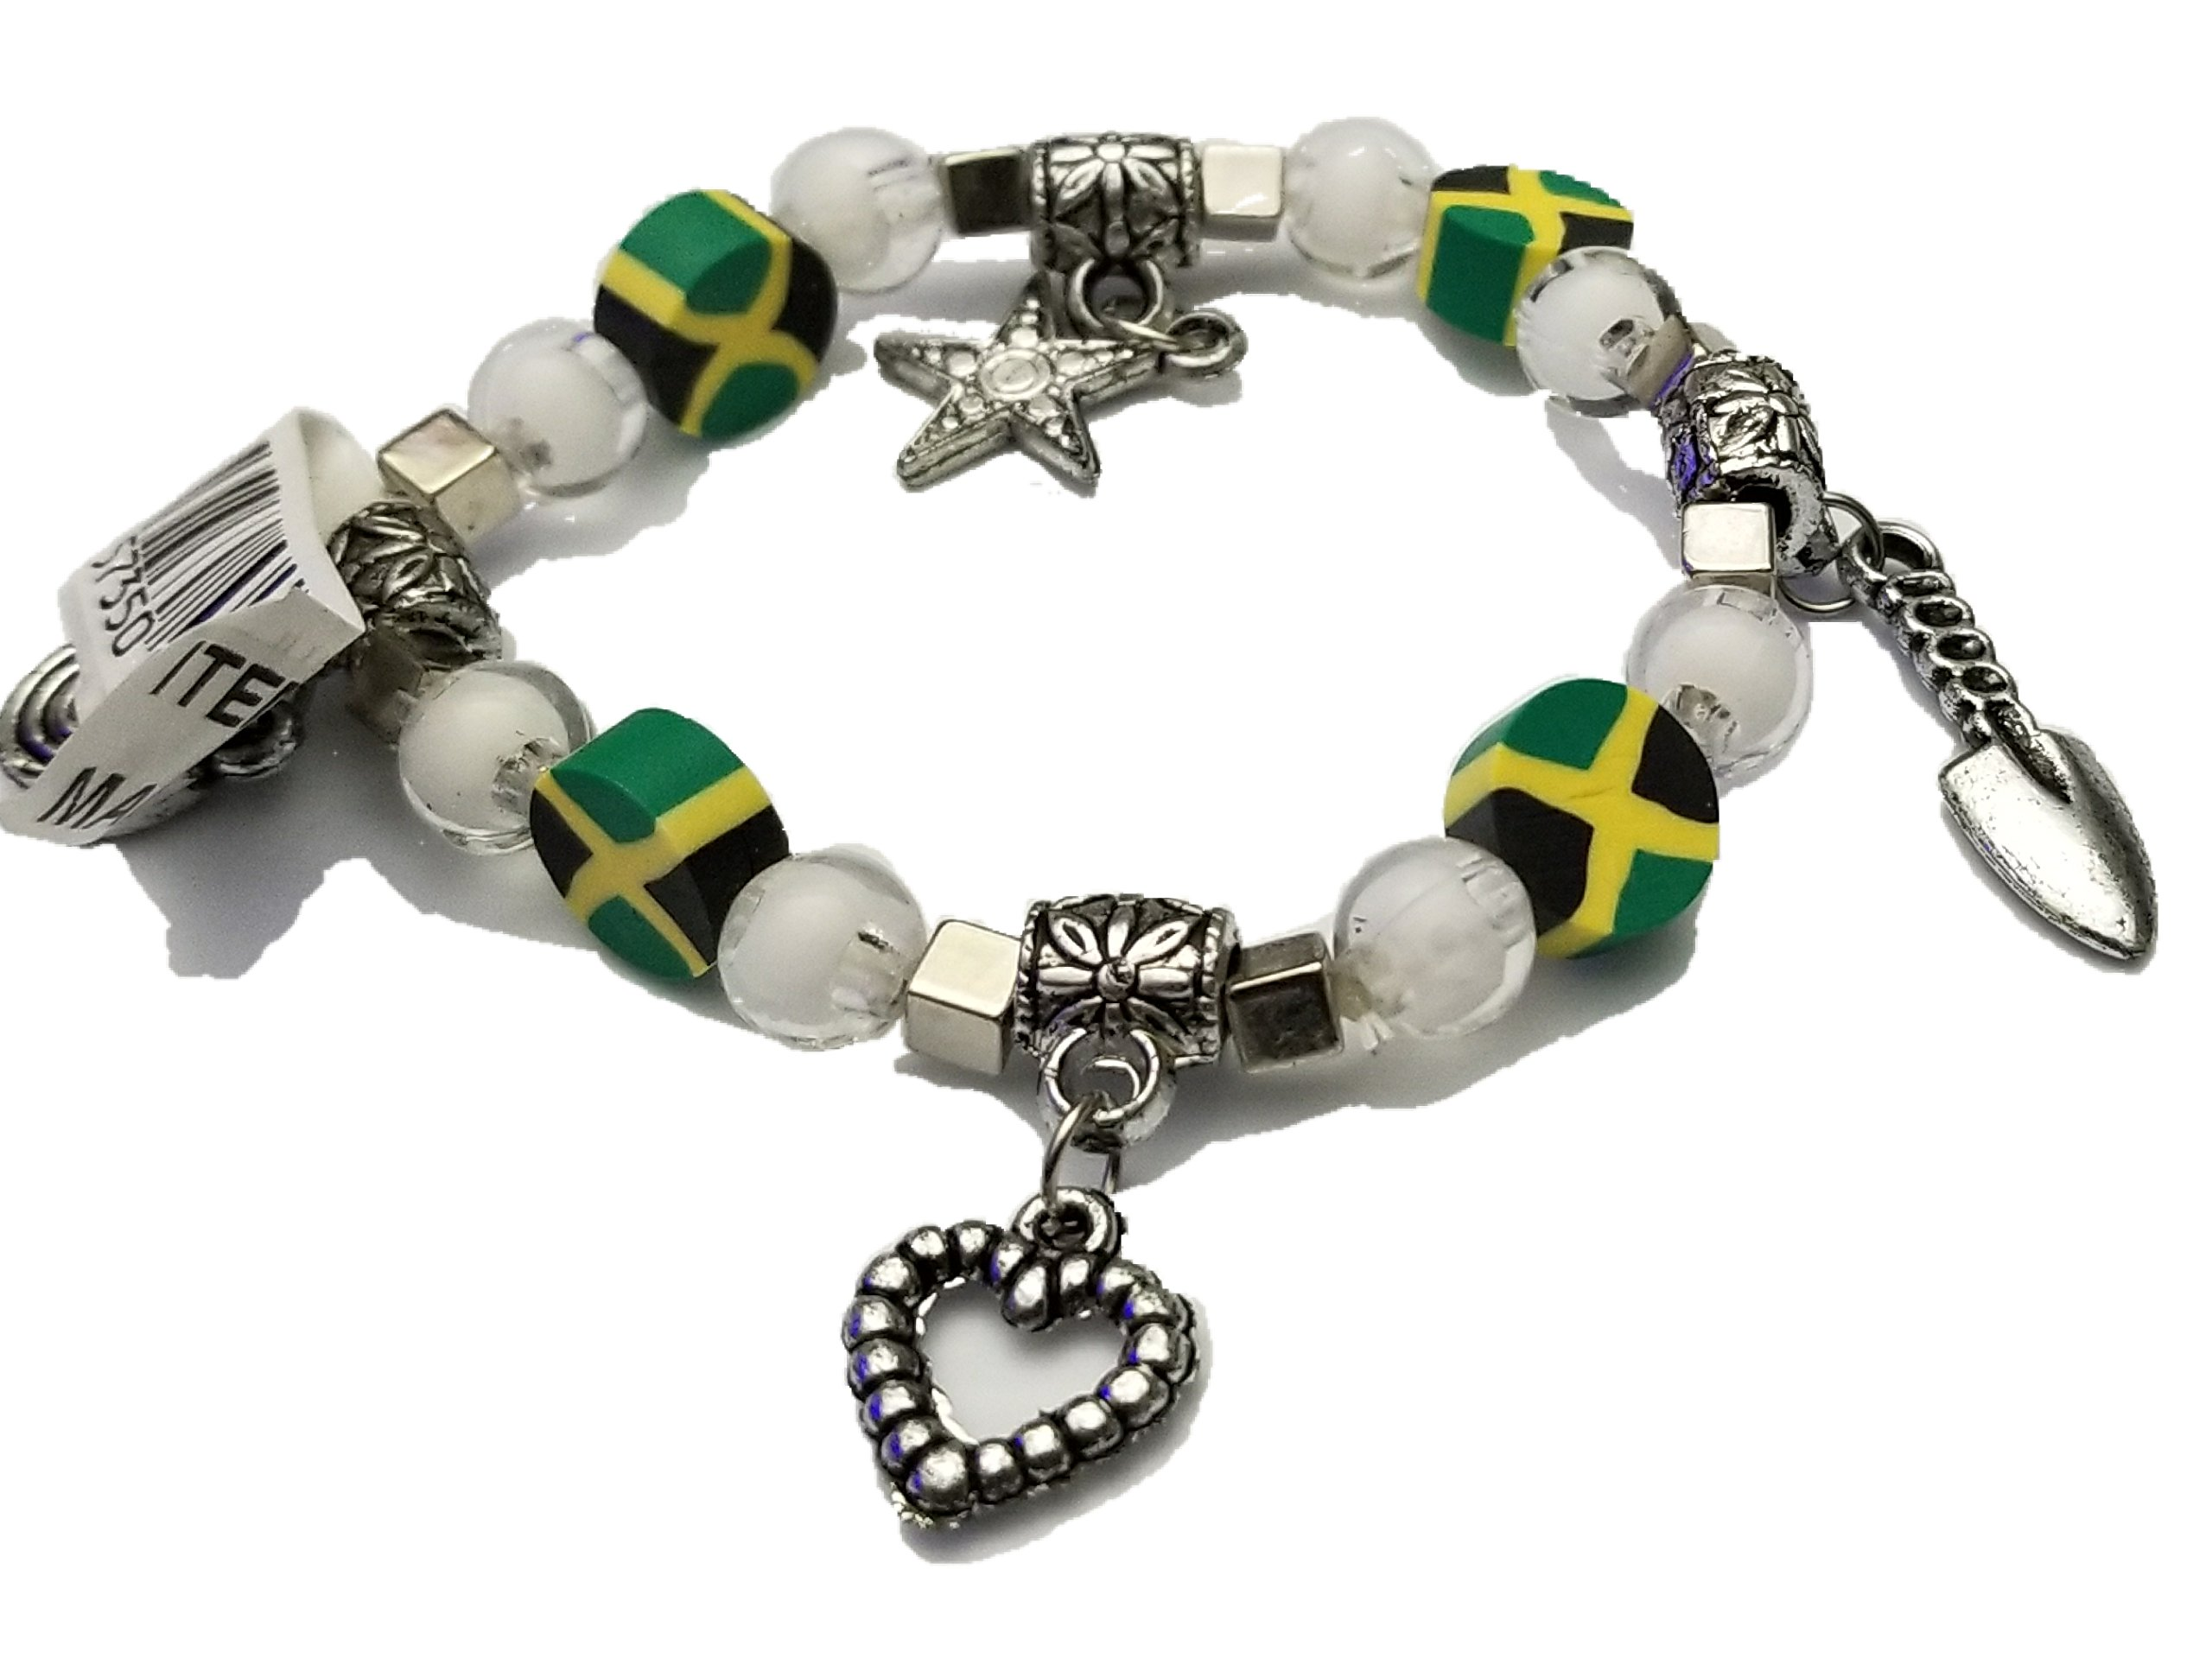 BUNFIREs Women Jamaica Jamaican Flag Bracelets Jewelry (Bracelet Charm) by BUNFIREs (Image #1)